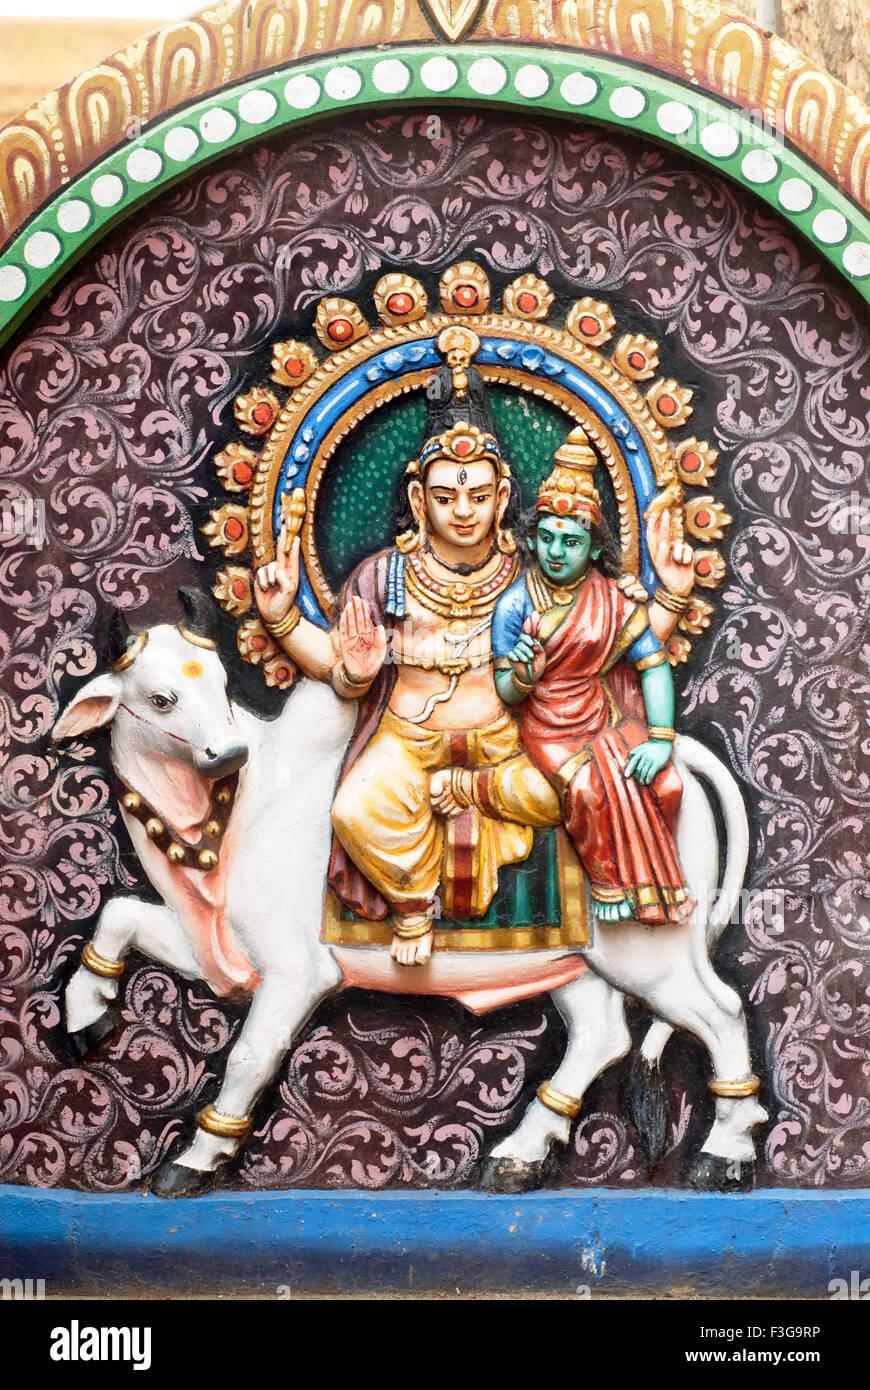 painted relief stucco figures lord Shiva Parvati riding Rishabha Shri Thayumanaswami temple Rock fort Tiruchirappalli - Stock Image